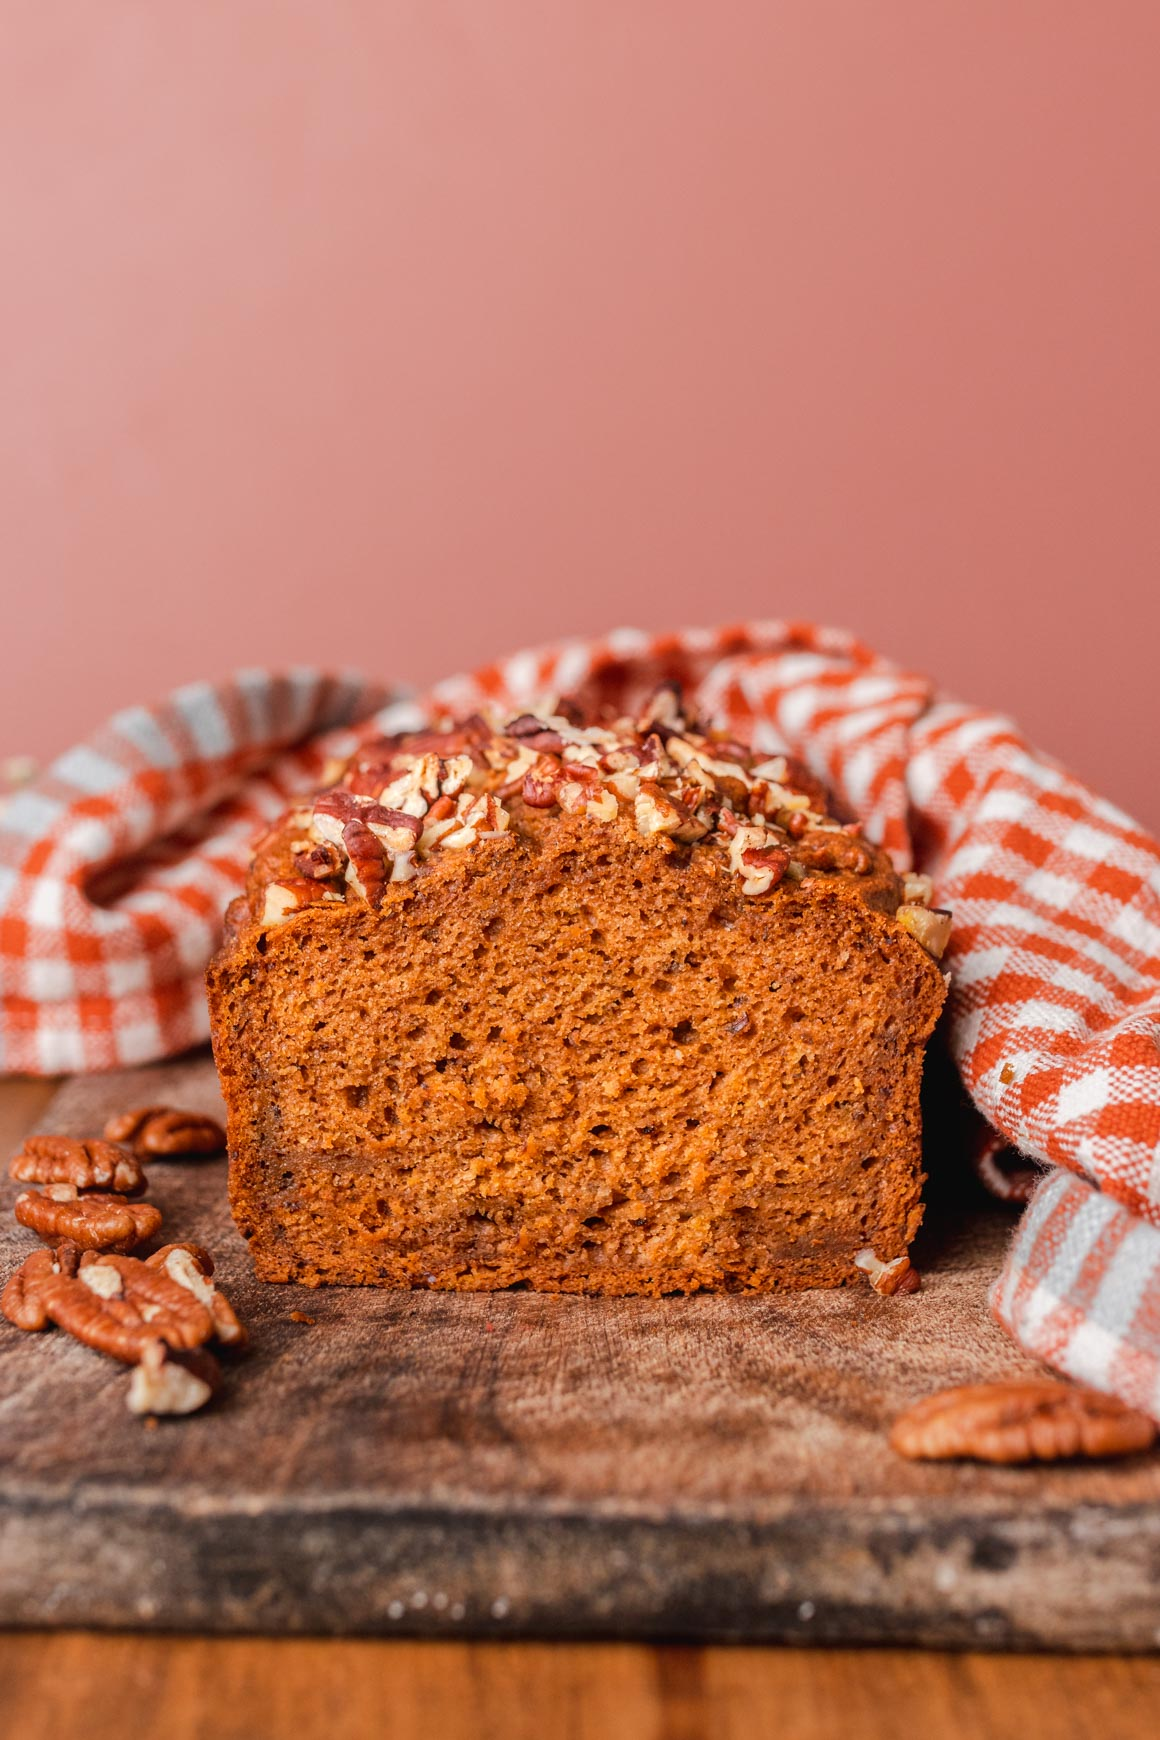 Vegan Pumpkin Loaf with Toasted Pecans